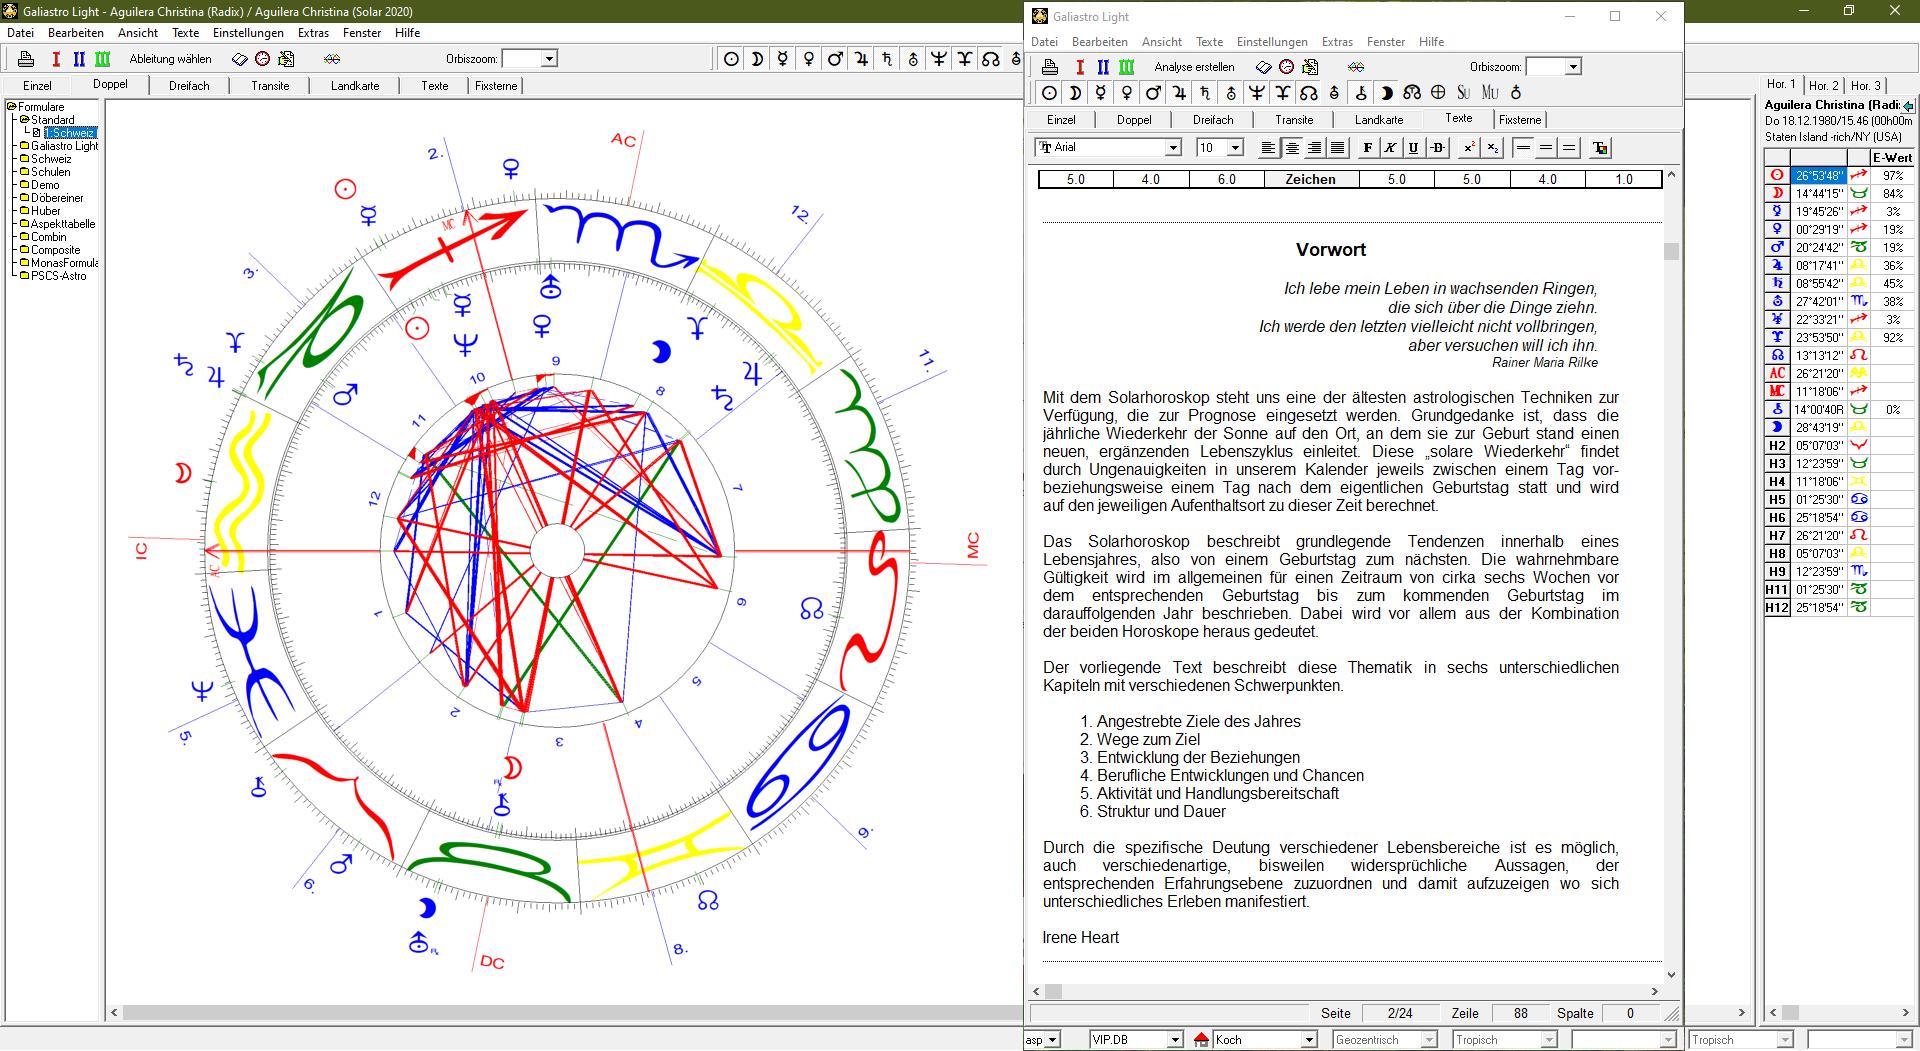 Deutung des Solar-Horoskops nach Irene Heart